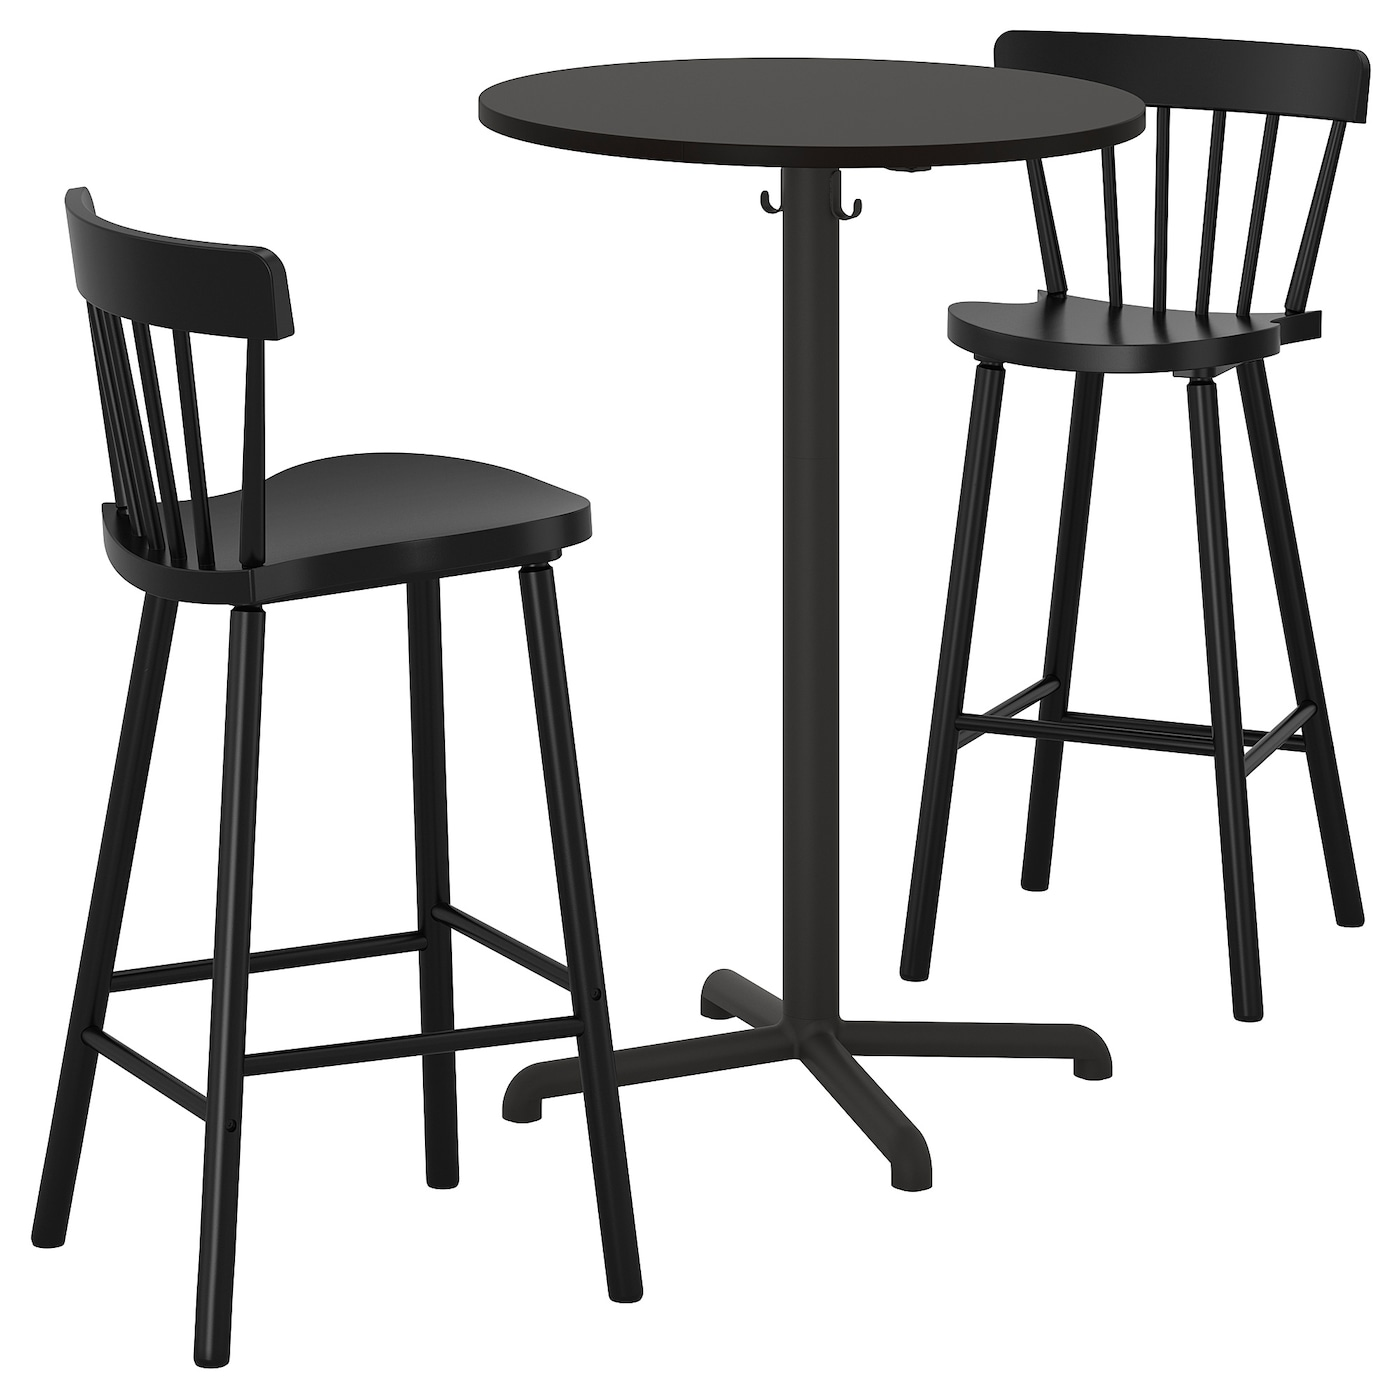 NORRARYD Barstol, svart IKEA